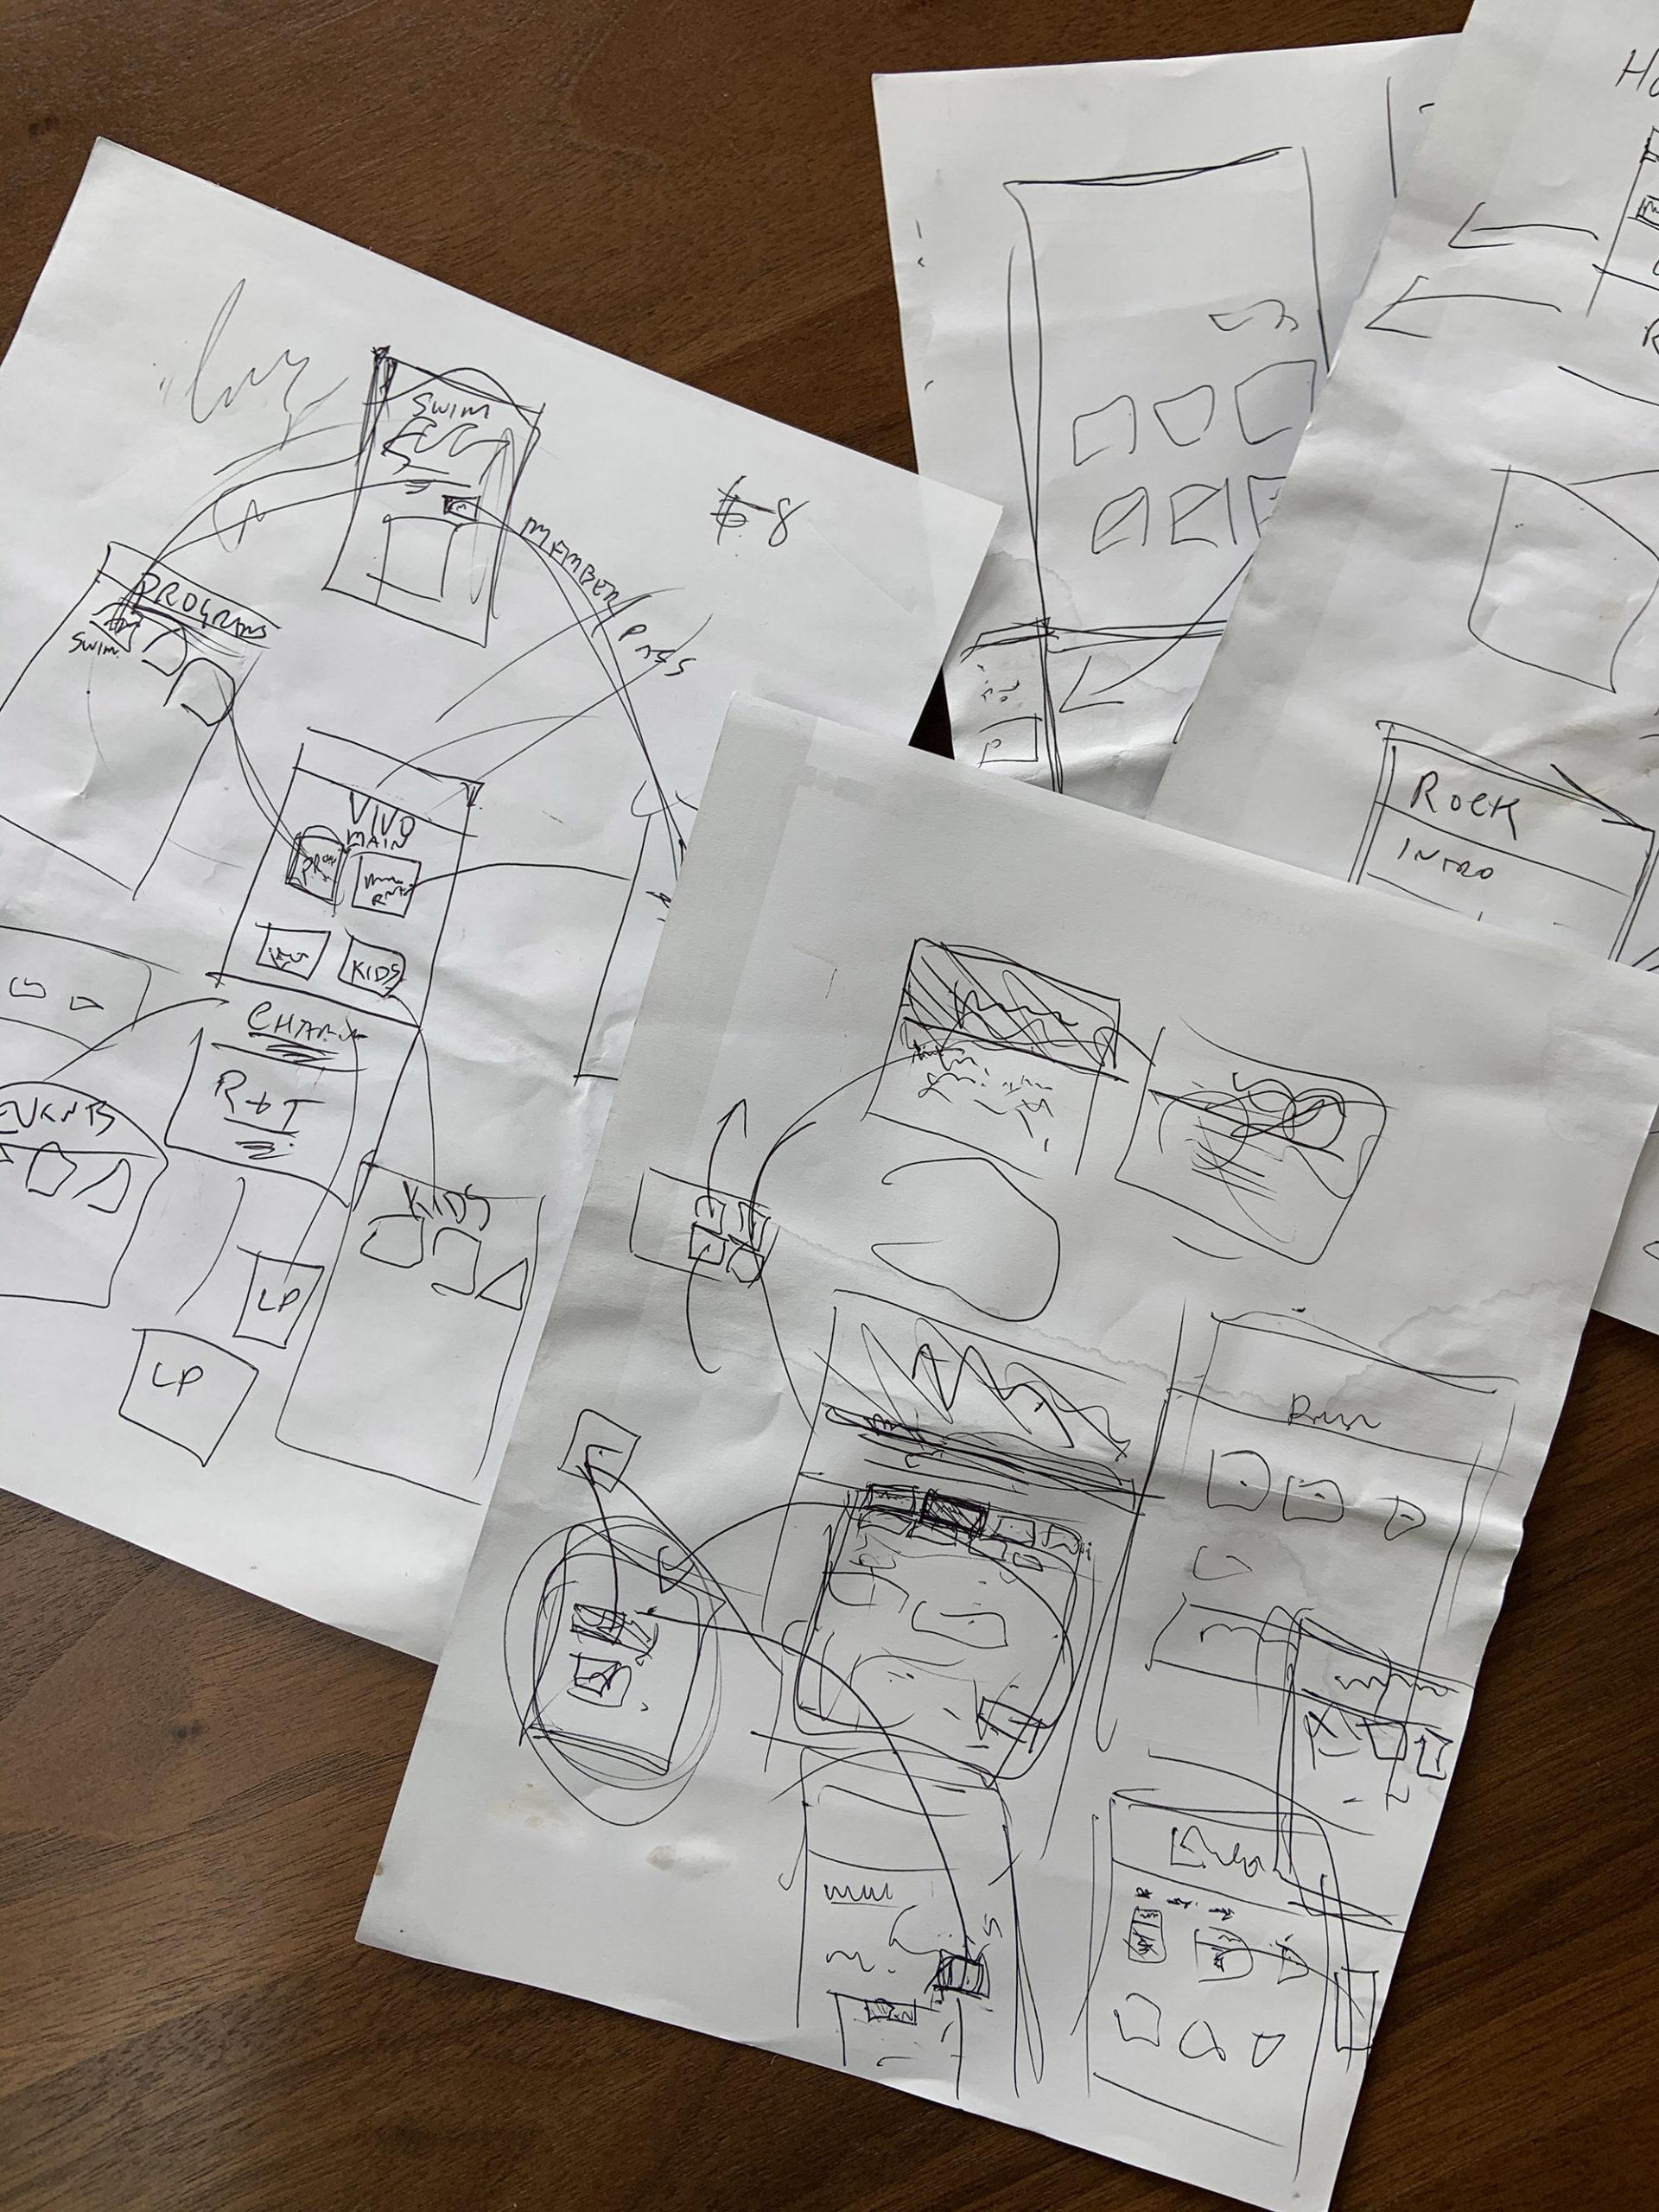 wireframe sketch